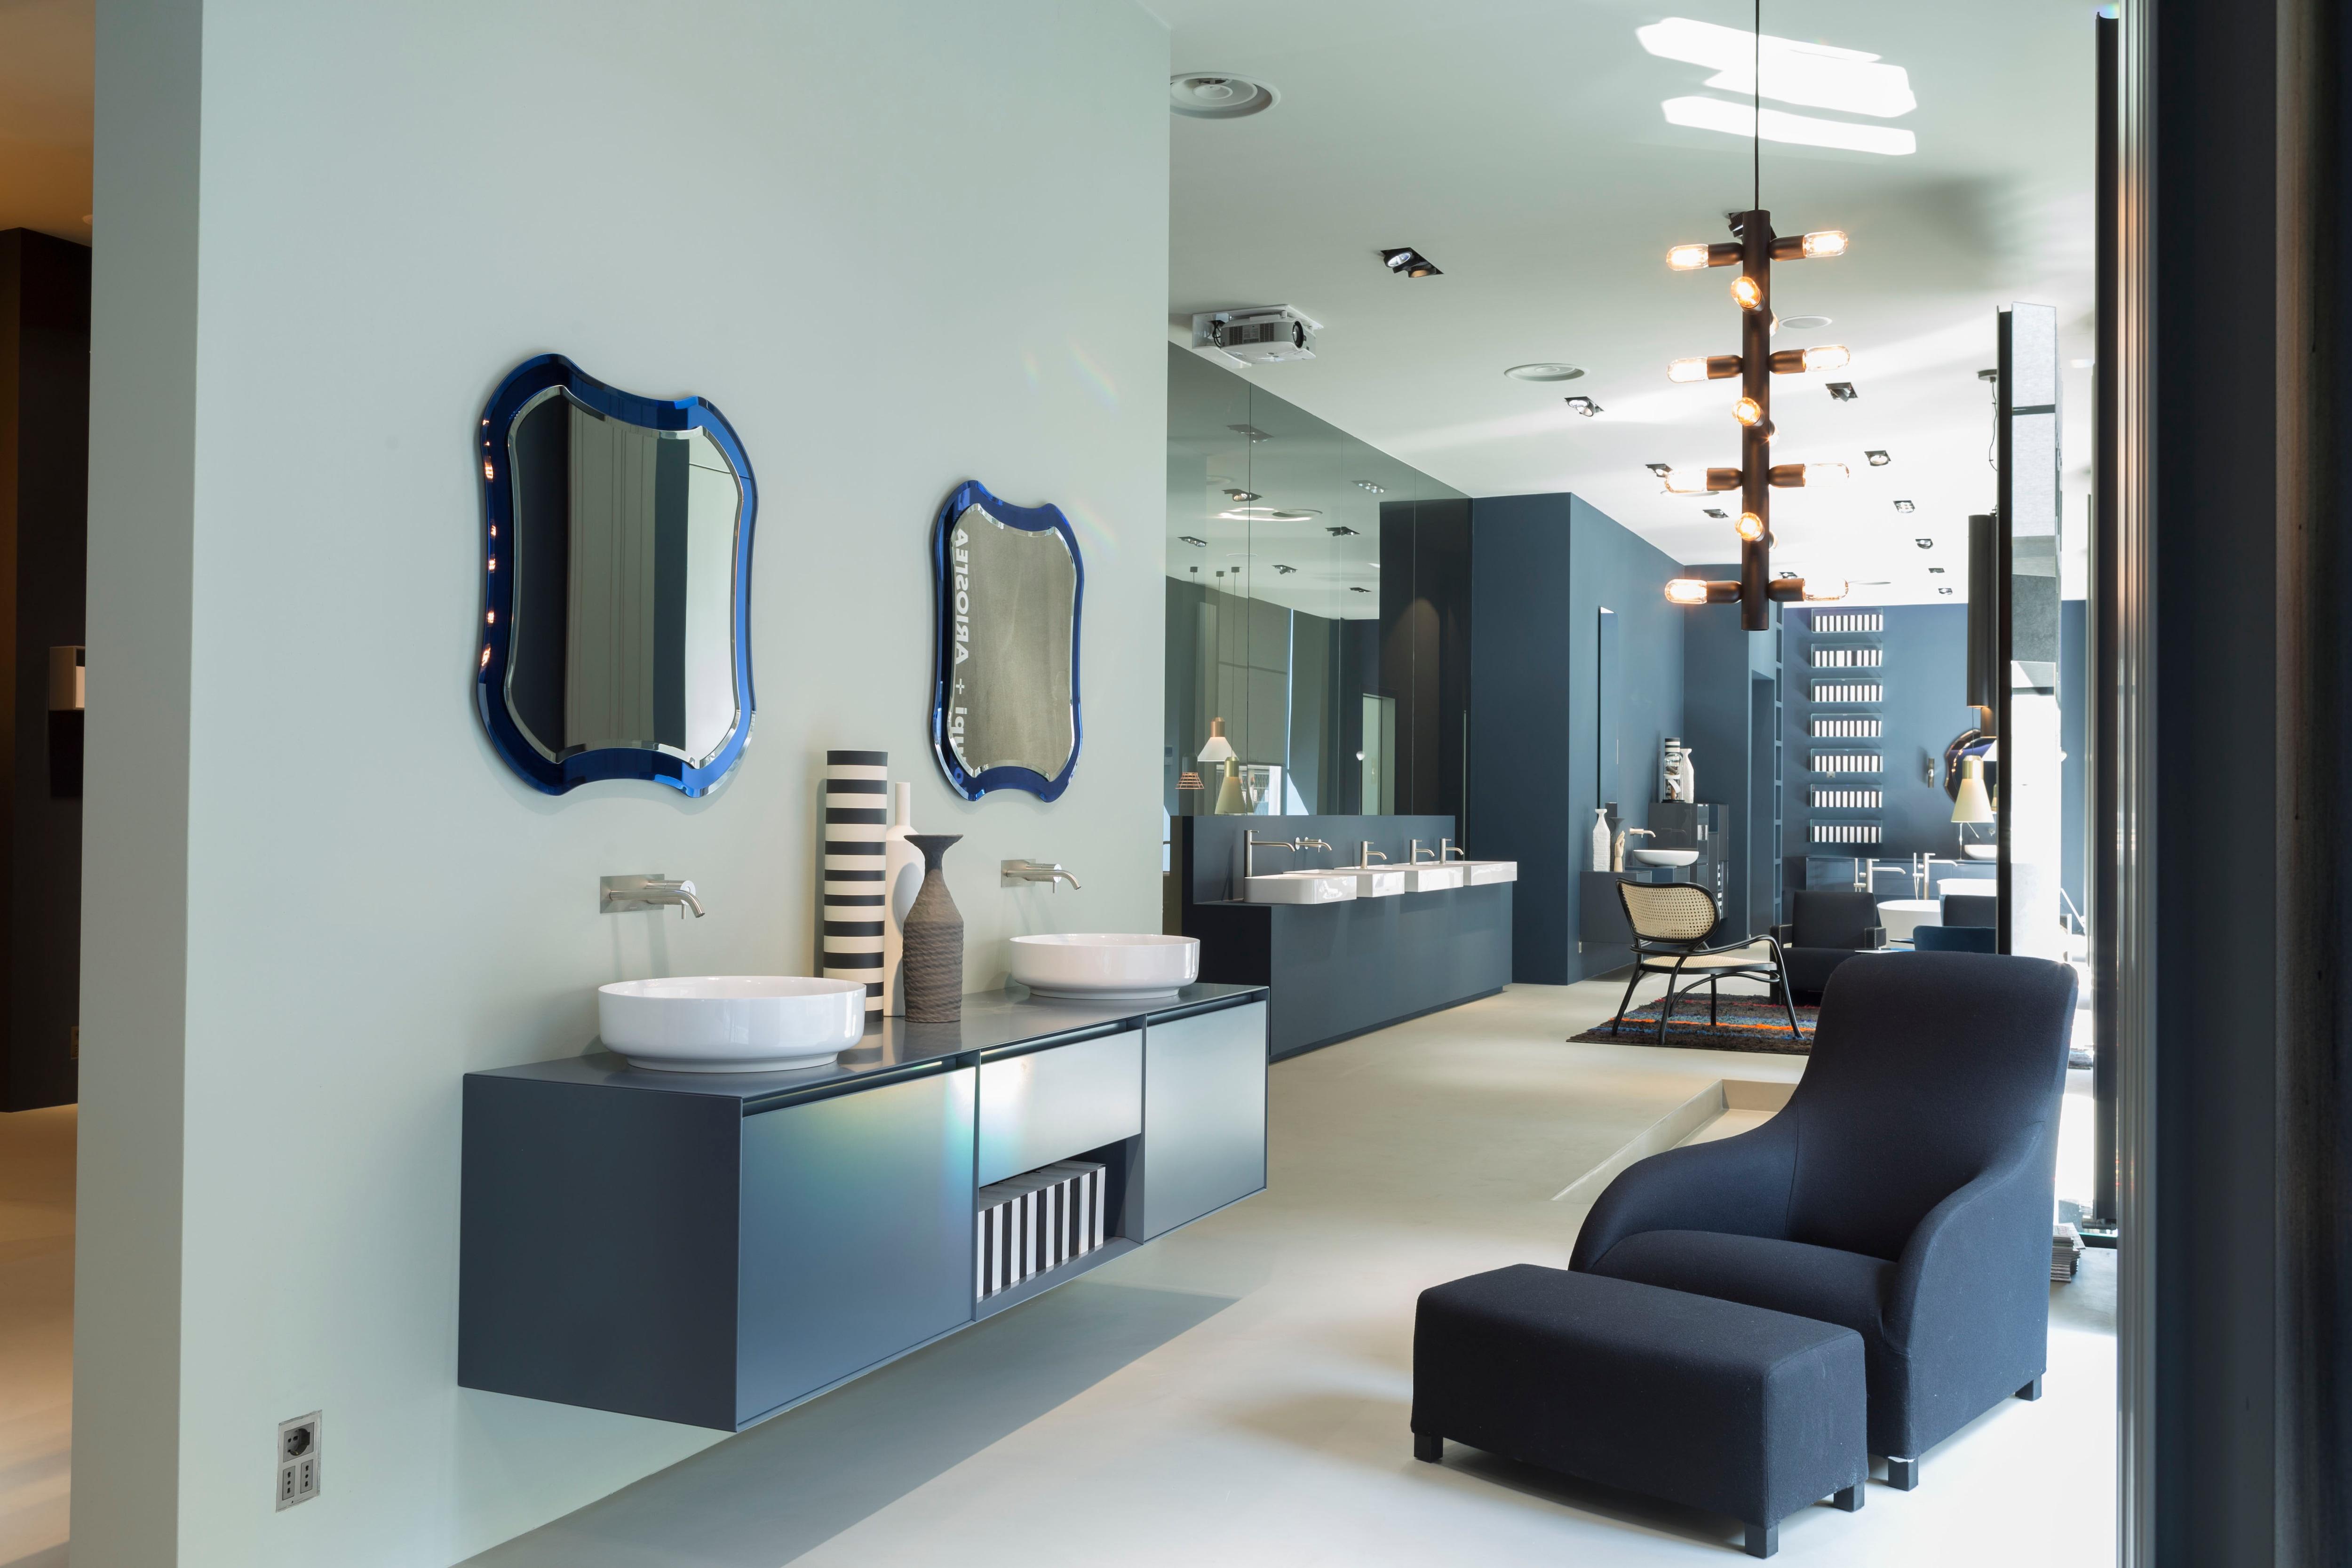 Stunning Antonio Lupi Prezzi Ideas - Brentwoodseasidecabins.com ...